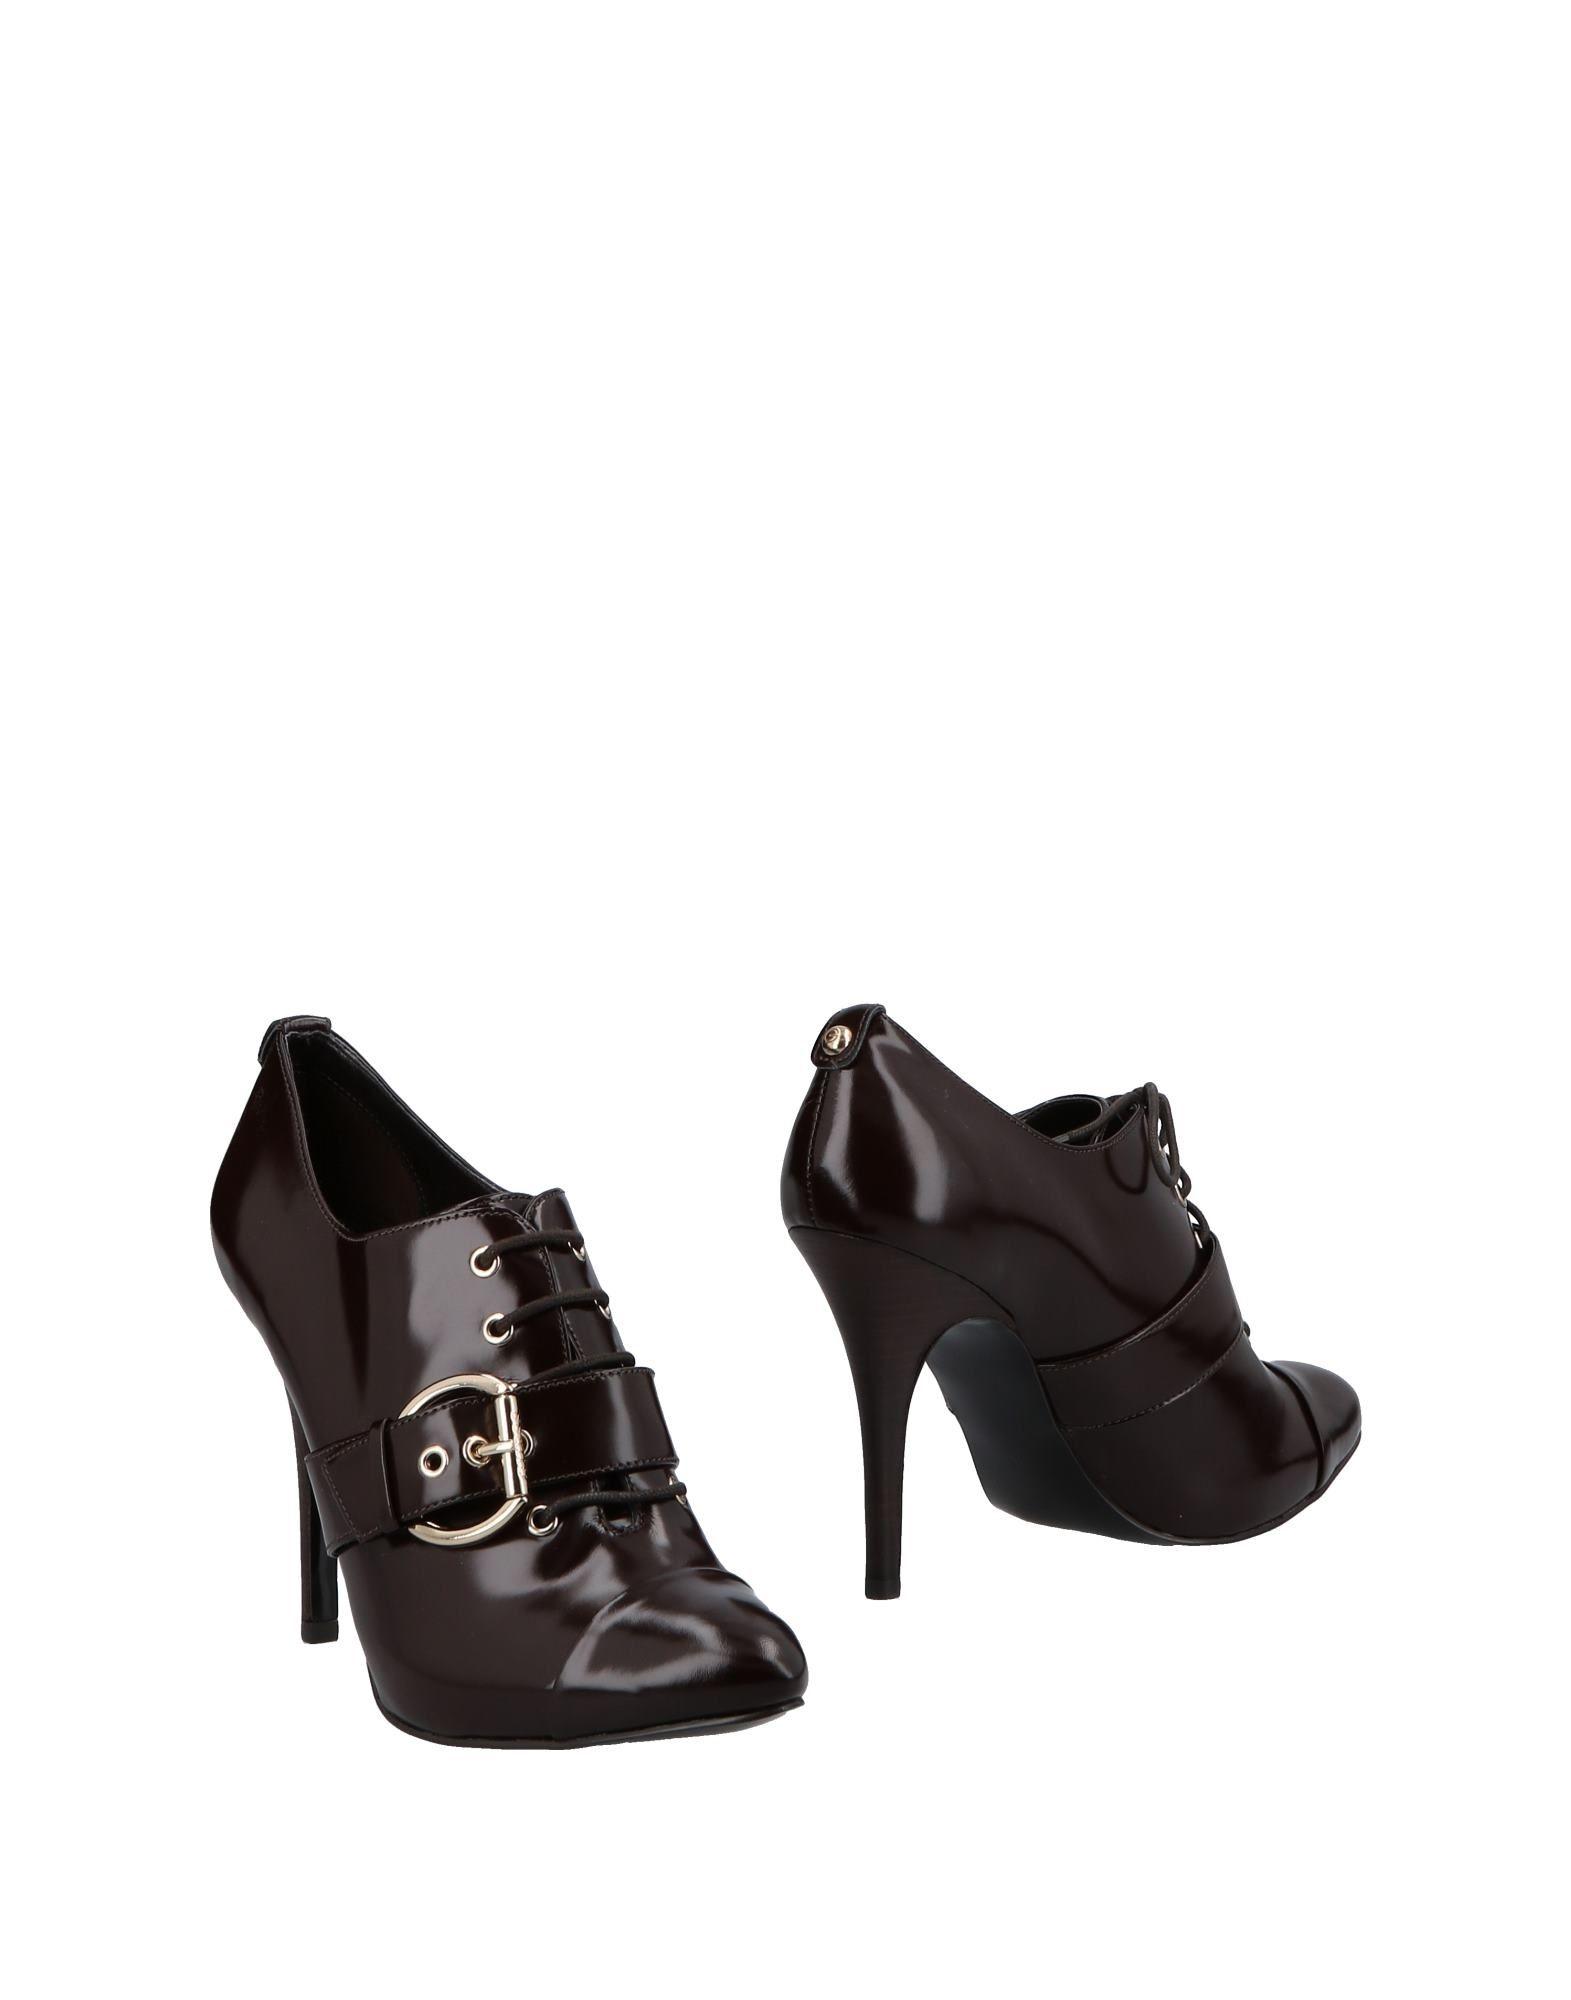 Guess By Marciano Stiefelette Damen  11504783DR Gute Qualität beliebte Schuhe